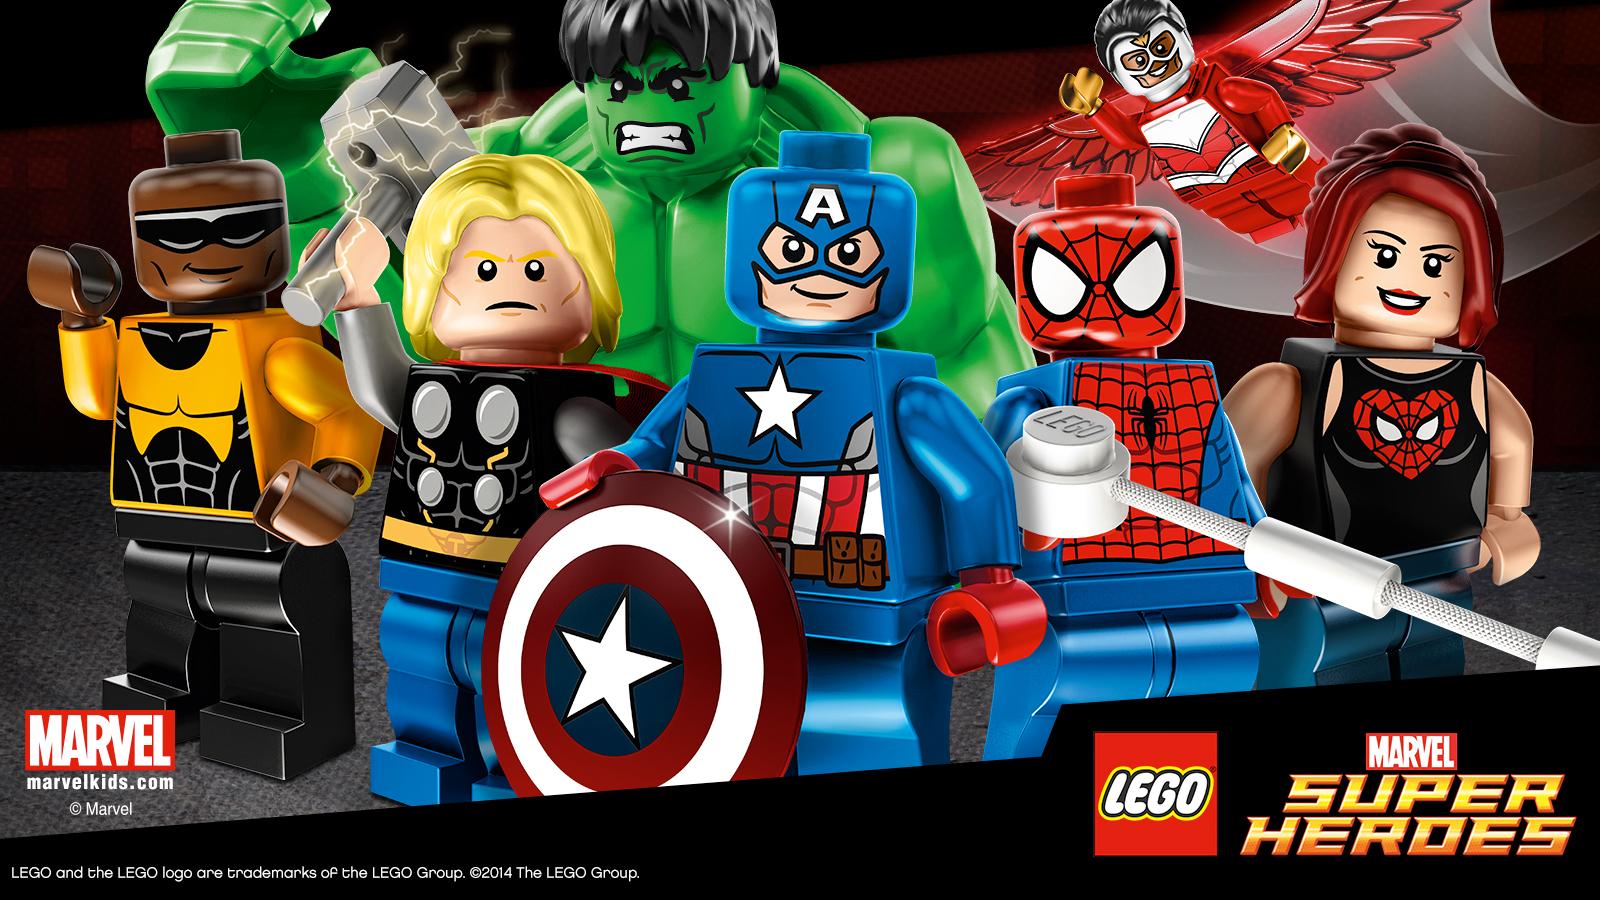 Free Download Lego Marvel Super Heroes Hd Wallpaper 13 1600